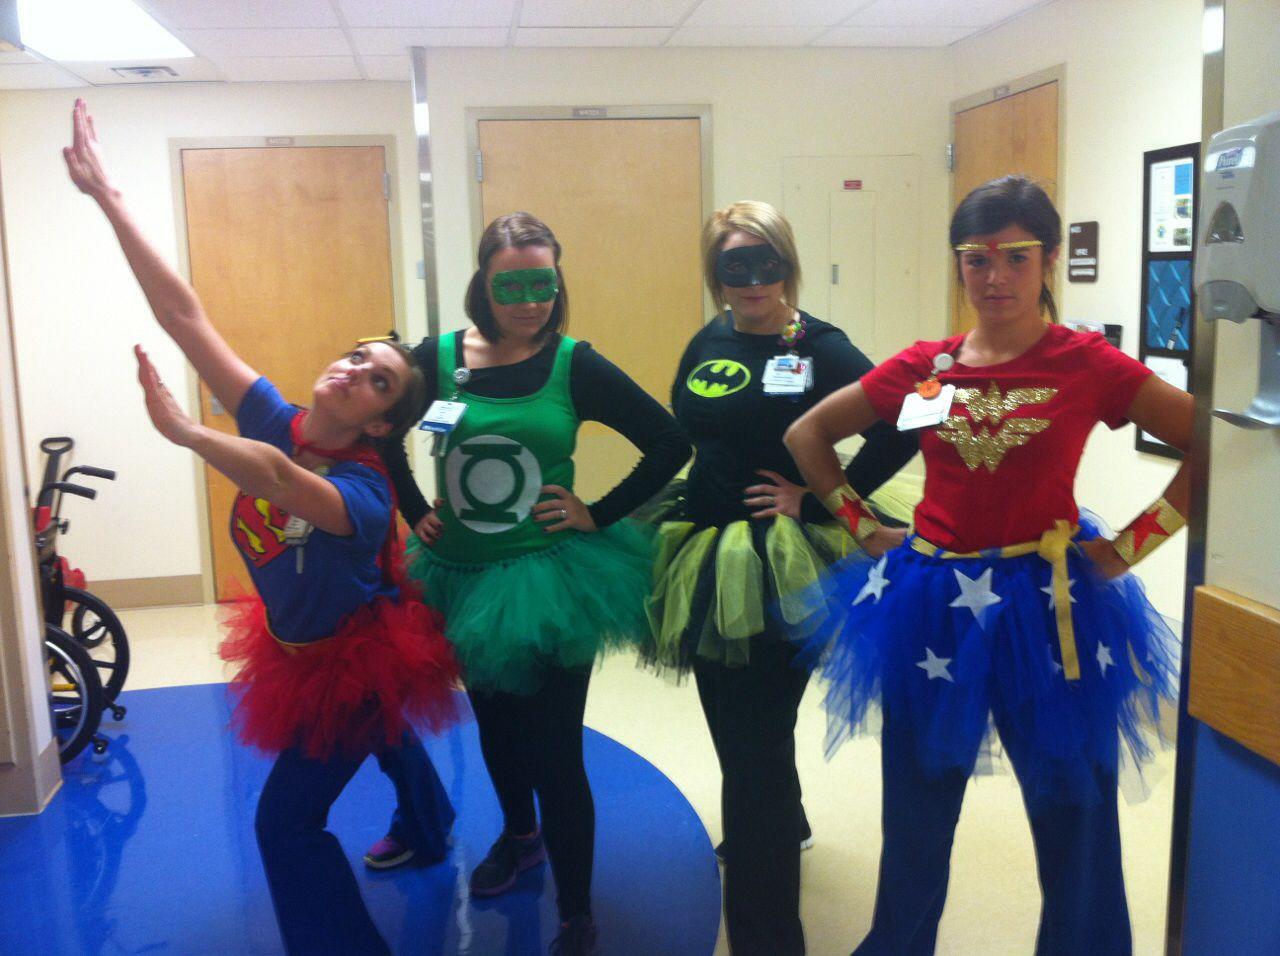 Halloween Costume Theme Ideas For Office.Superhero Halloween Costume For Pediatric Nurses I Love The